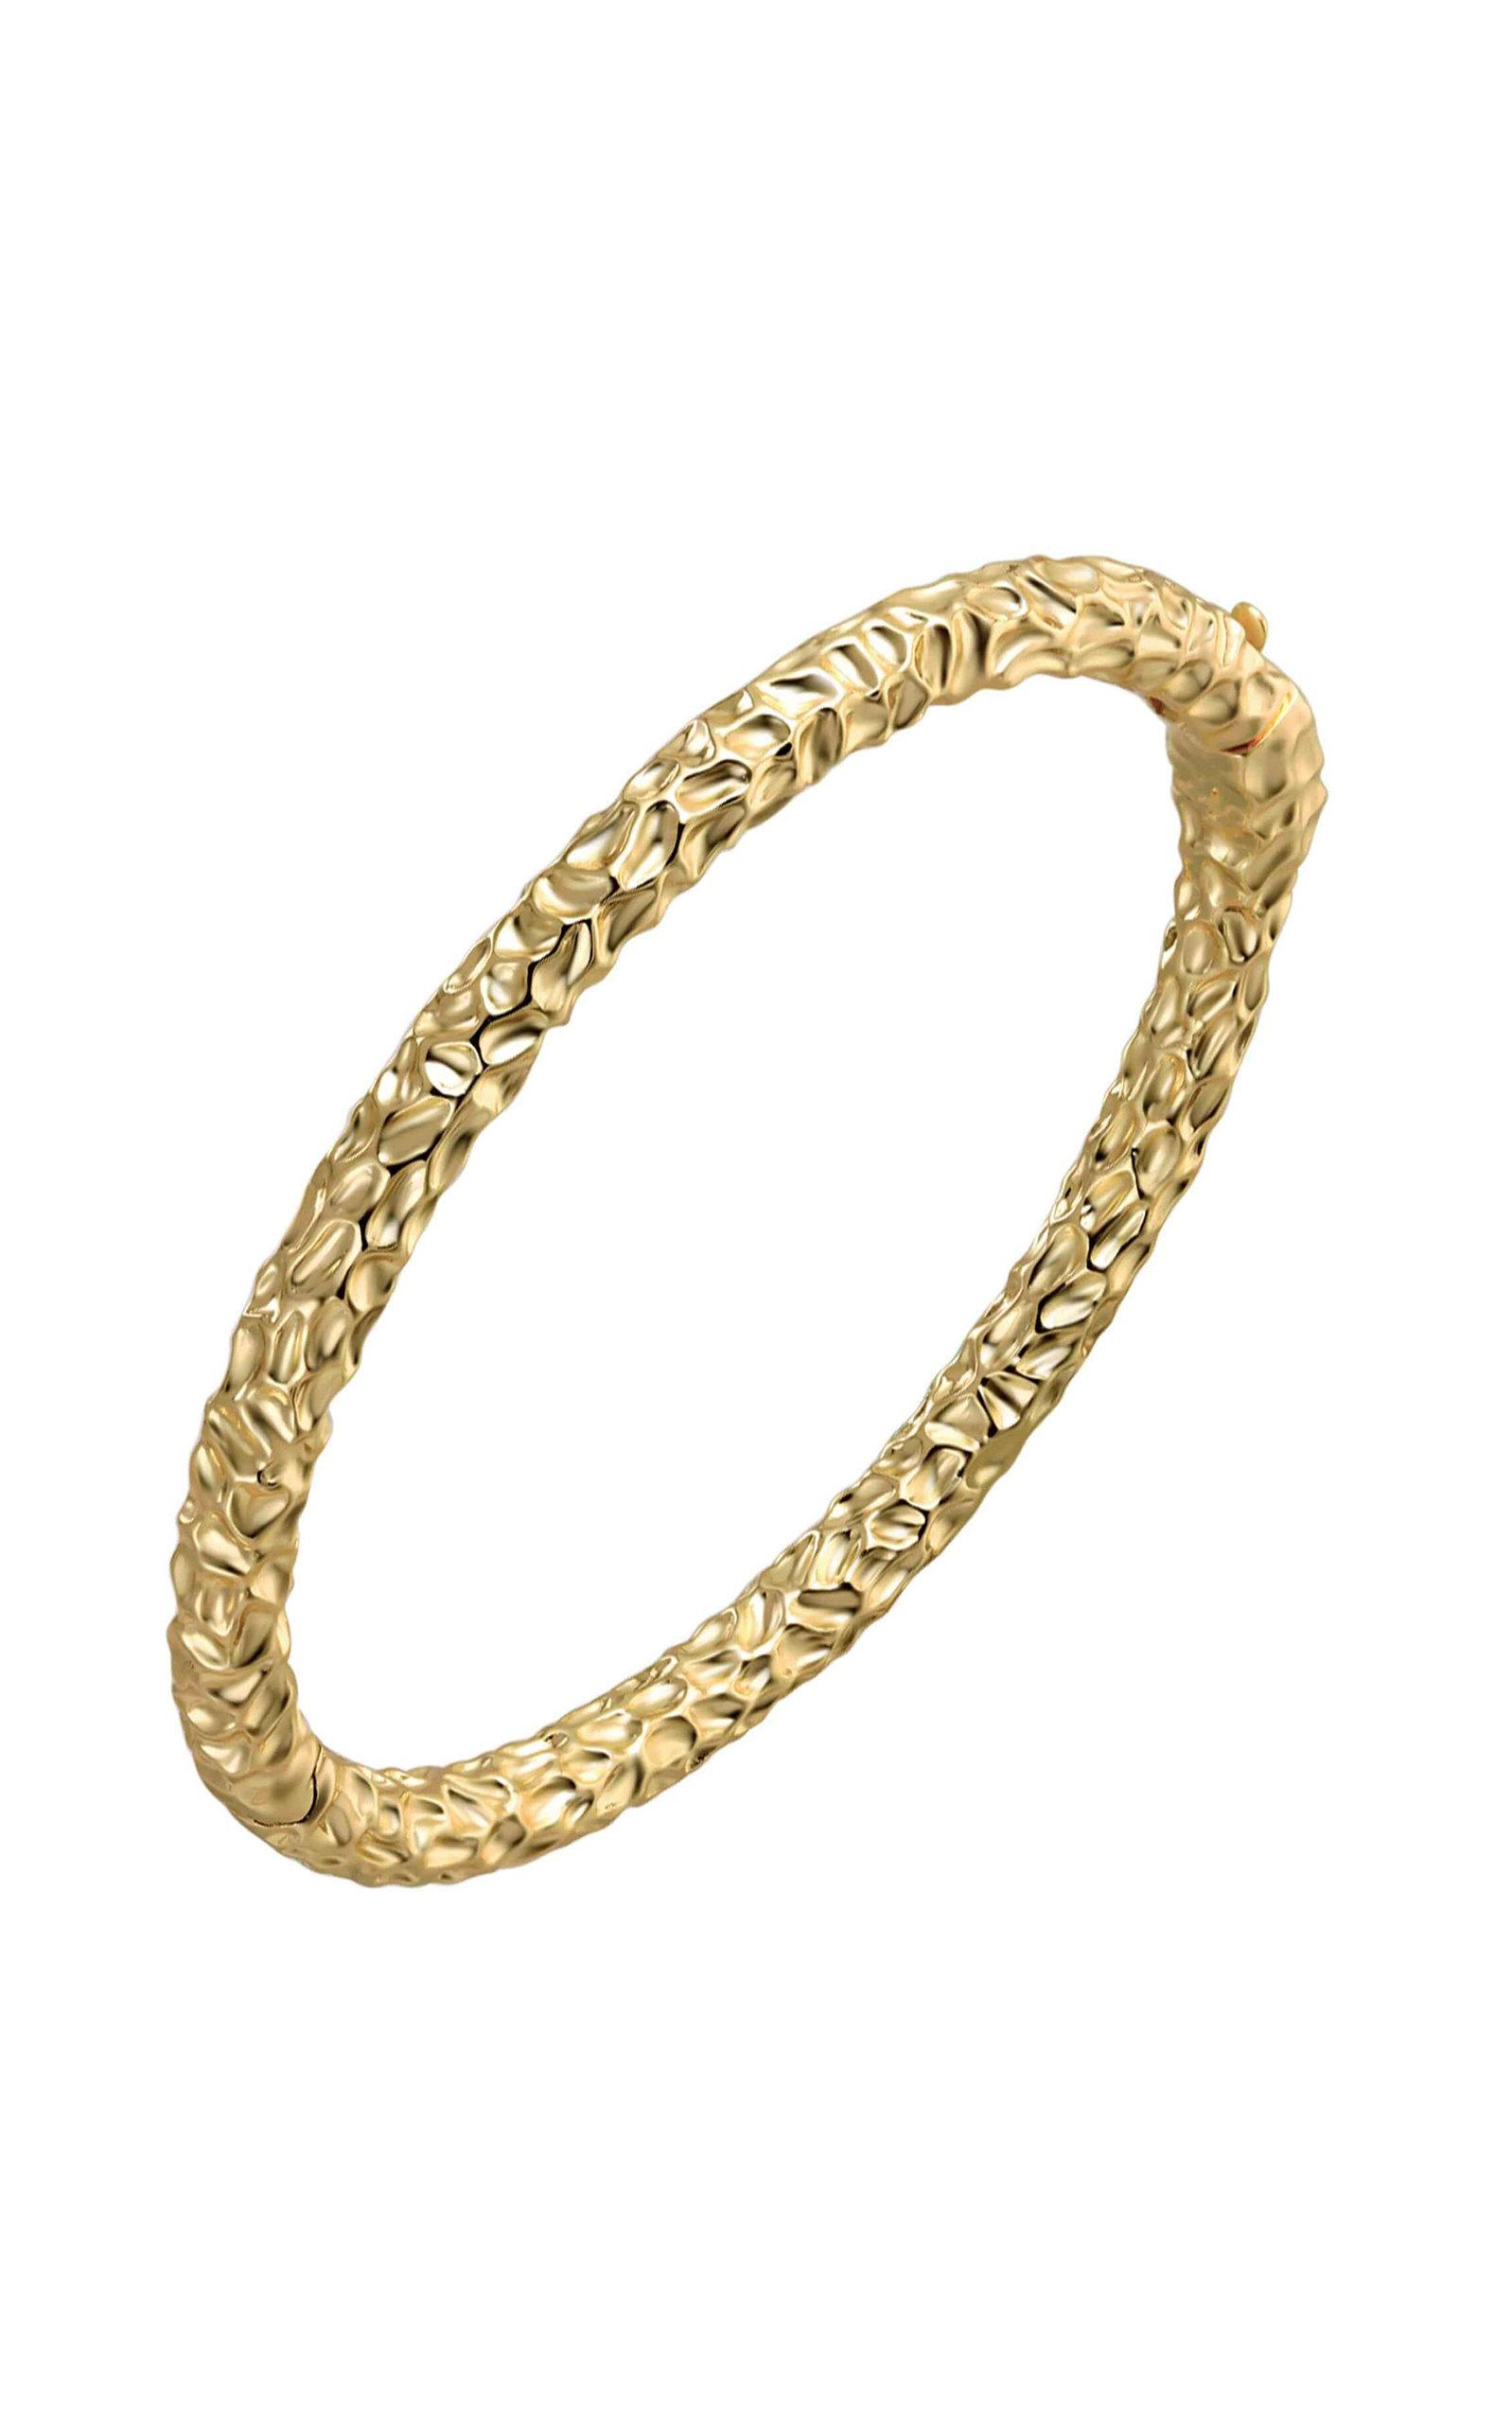 Emili - Women's Marla Gold-Plated Bangle - Gold - Moda Operandi